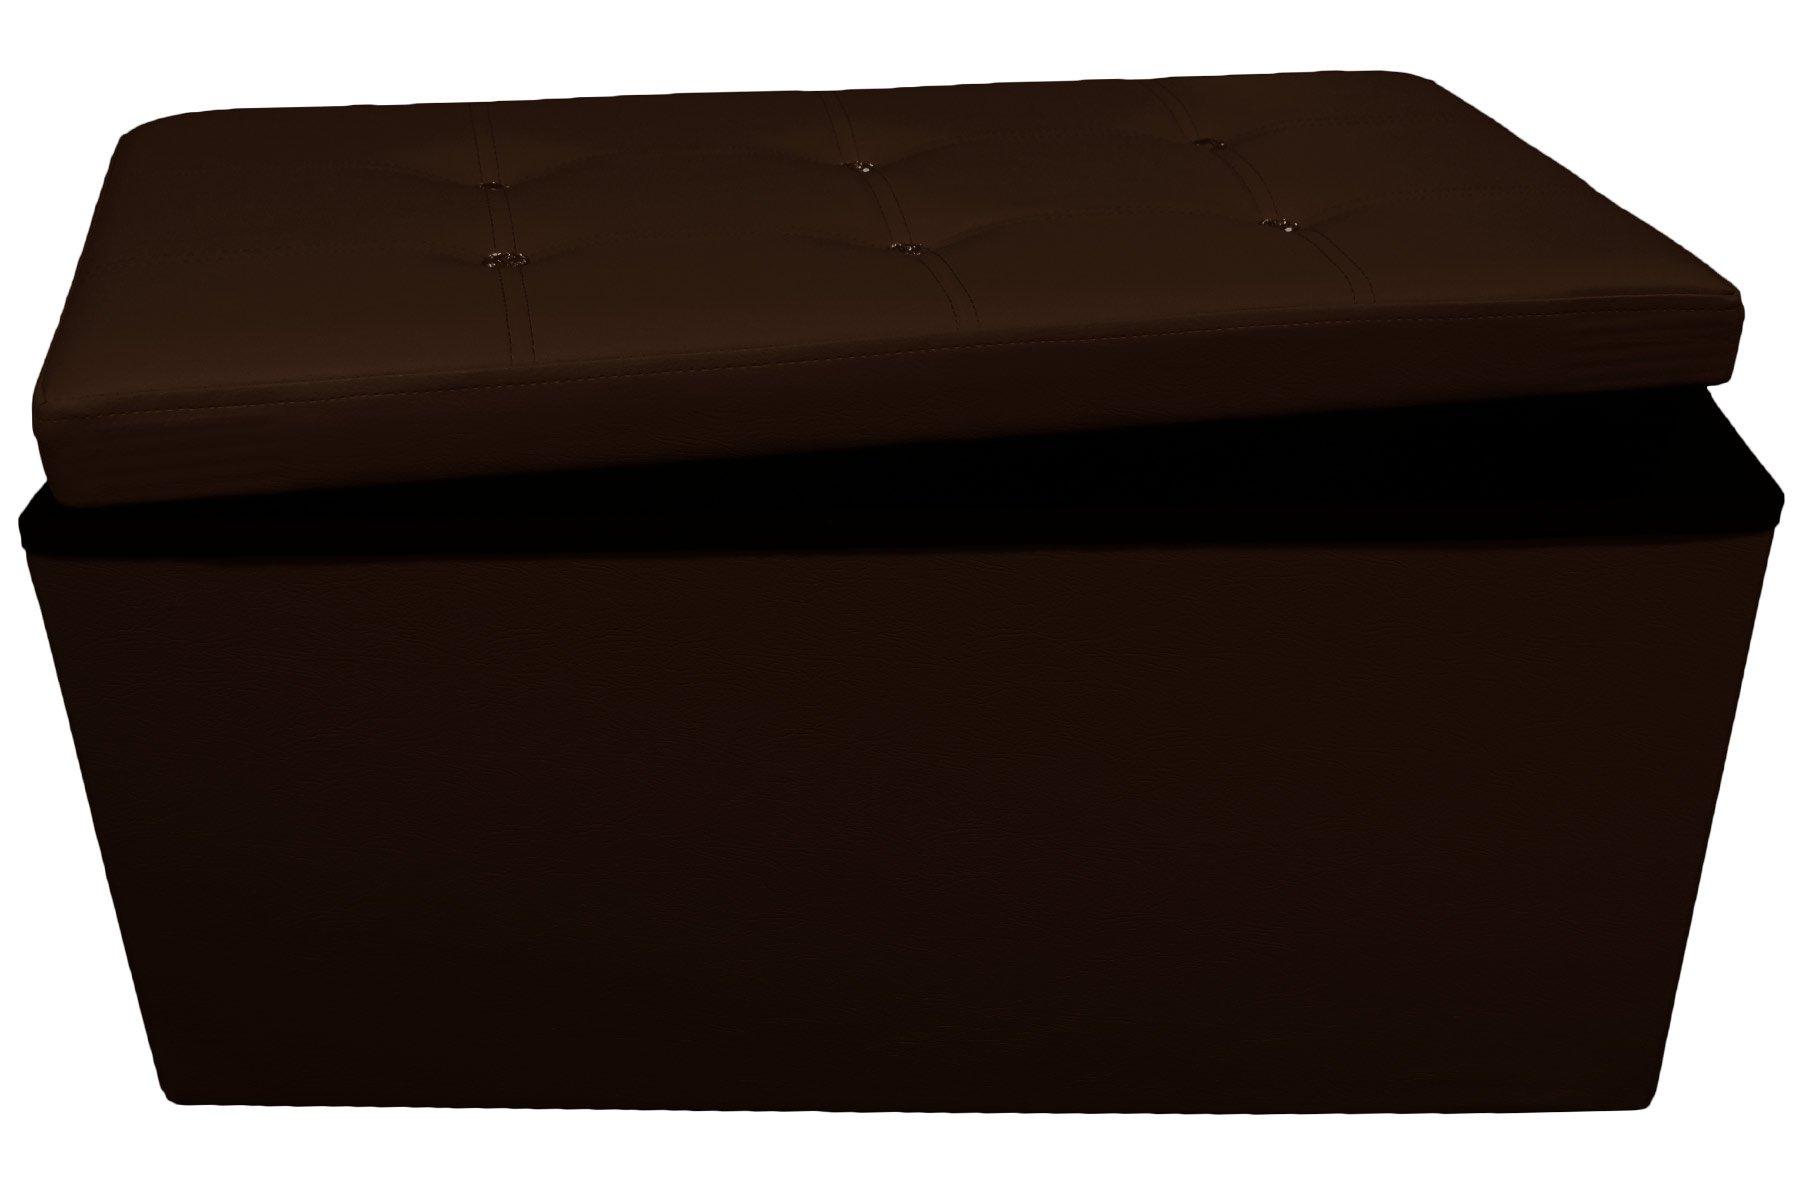 Panca Contenitore Ecopelle : Panca con contenitore tavolo cucina con due sedie e panca